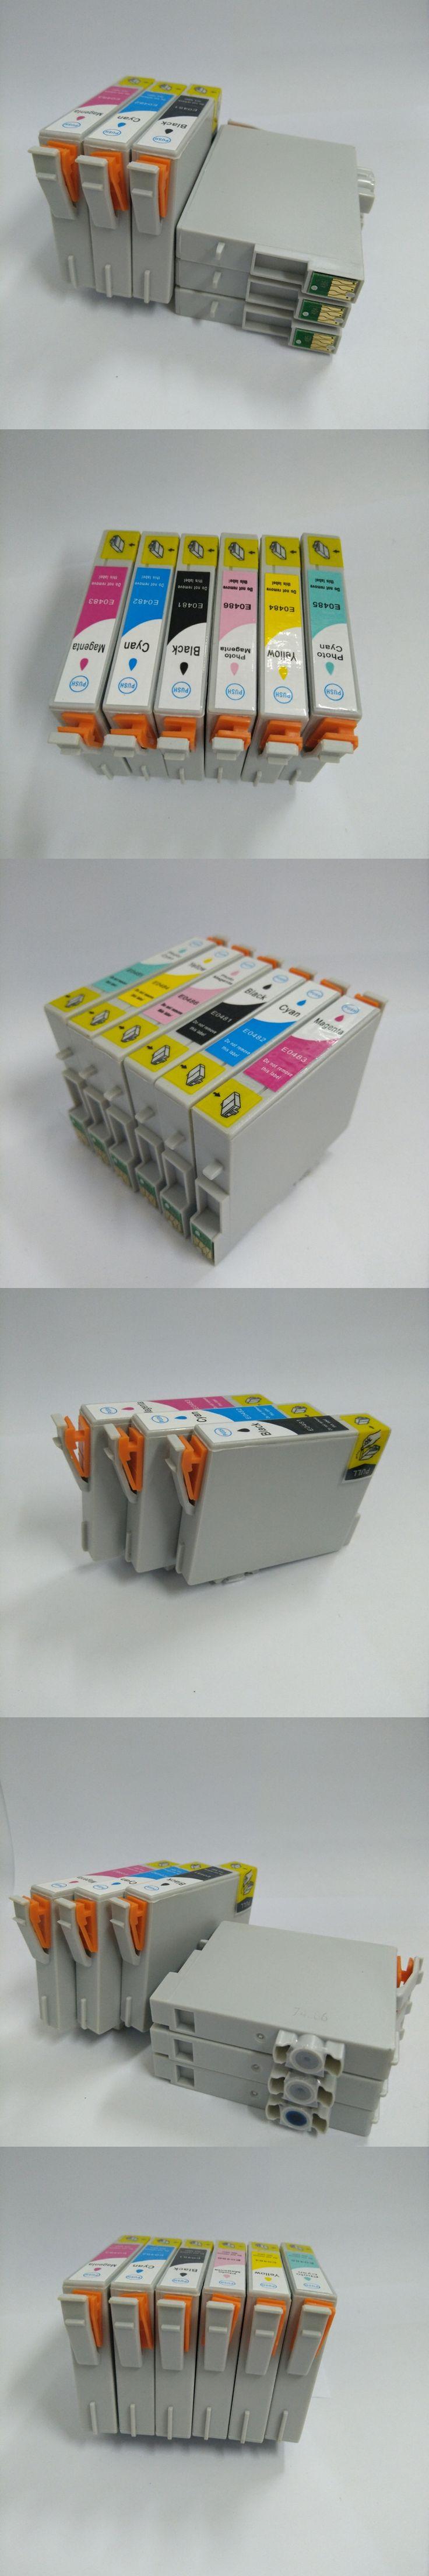 1 Set T0481 -6 Compatible Ink Cartridge For Epson Stylus Photo R220 R320 R200 R300 RX500 RX600 R300M R340 RX620 printer